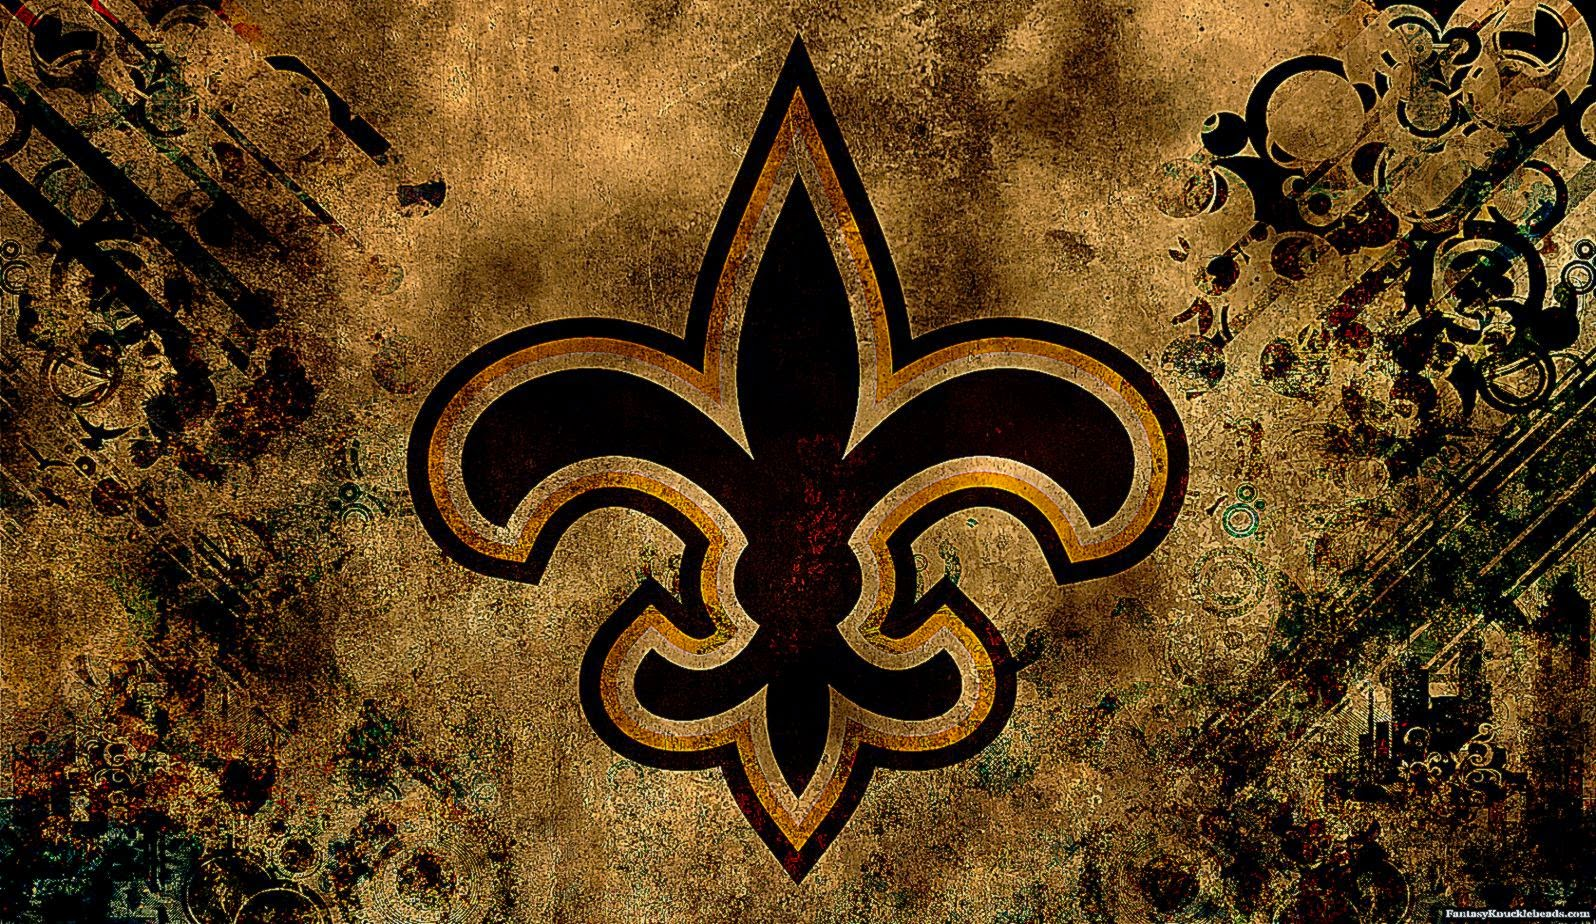 71 New Orleans Saints Desktop Wallpaper On Wallpapersafari